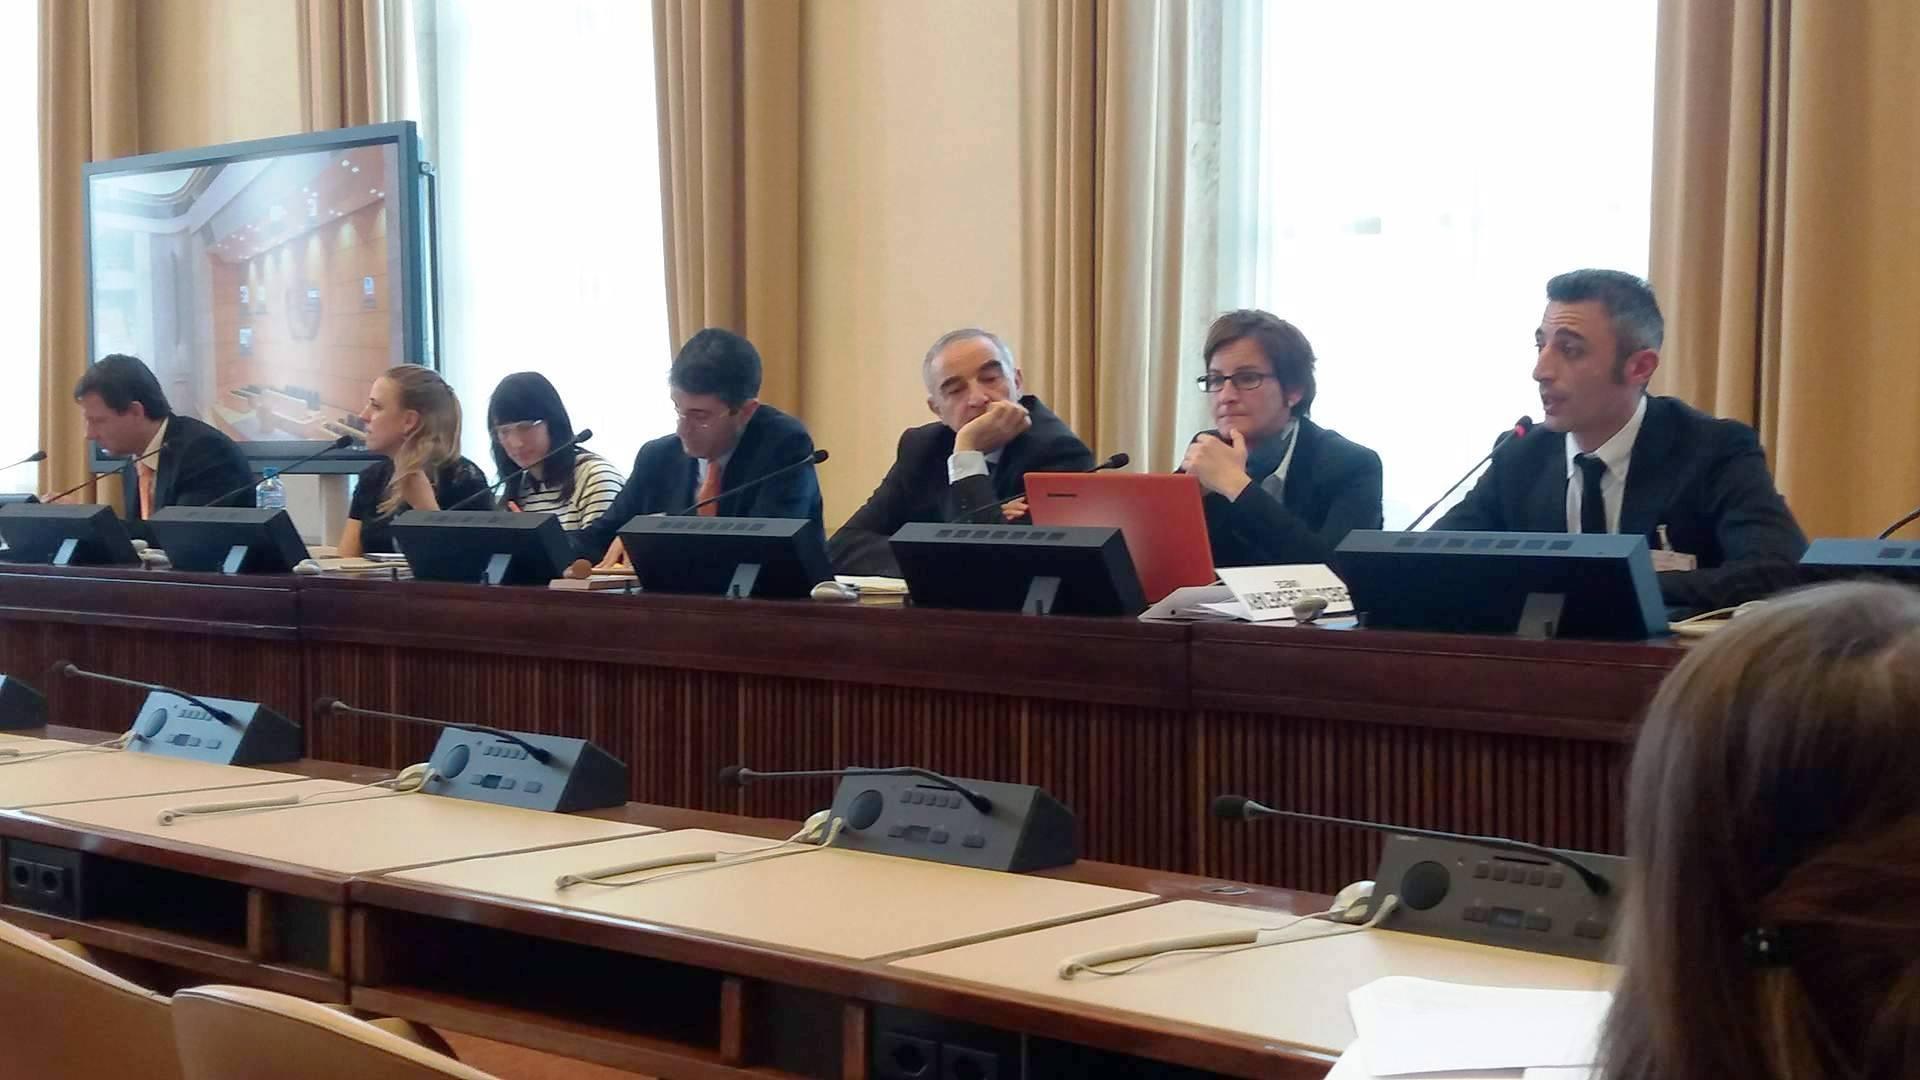 UNECE Regional Forum on  SDGs 2030 – Geneva 2017